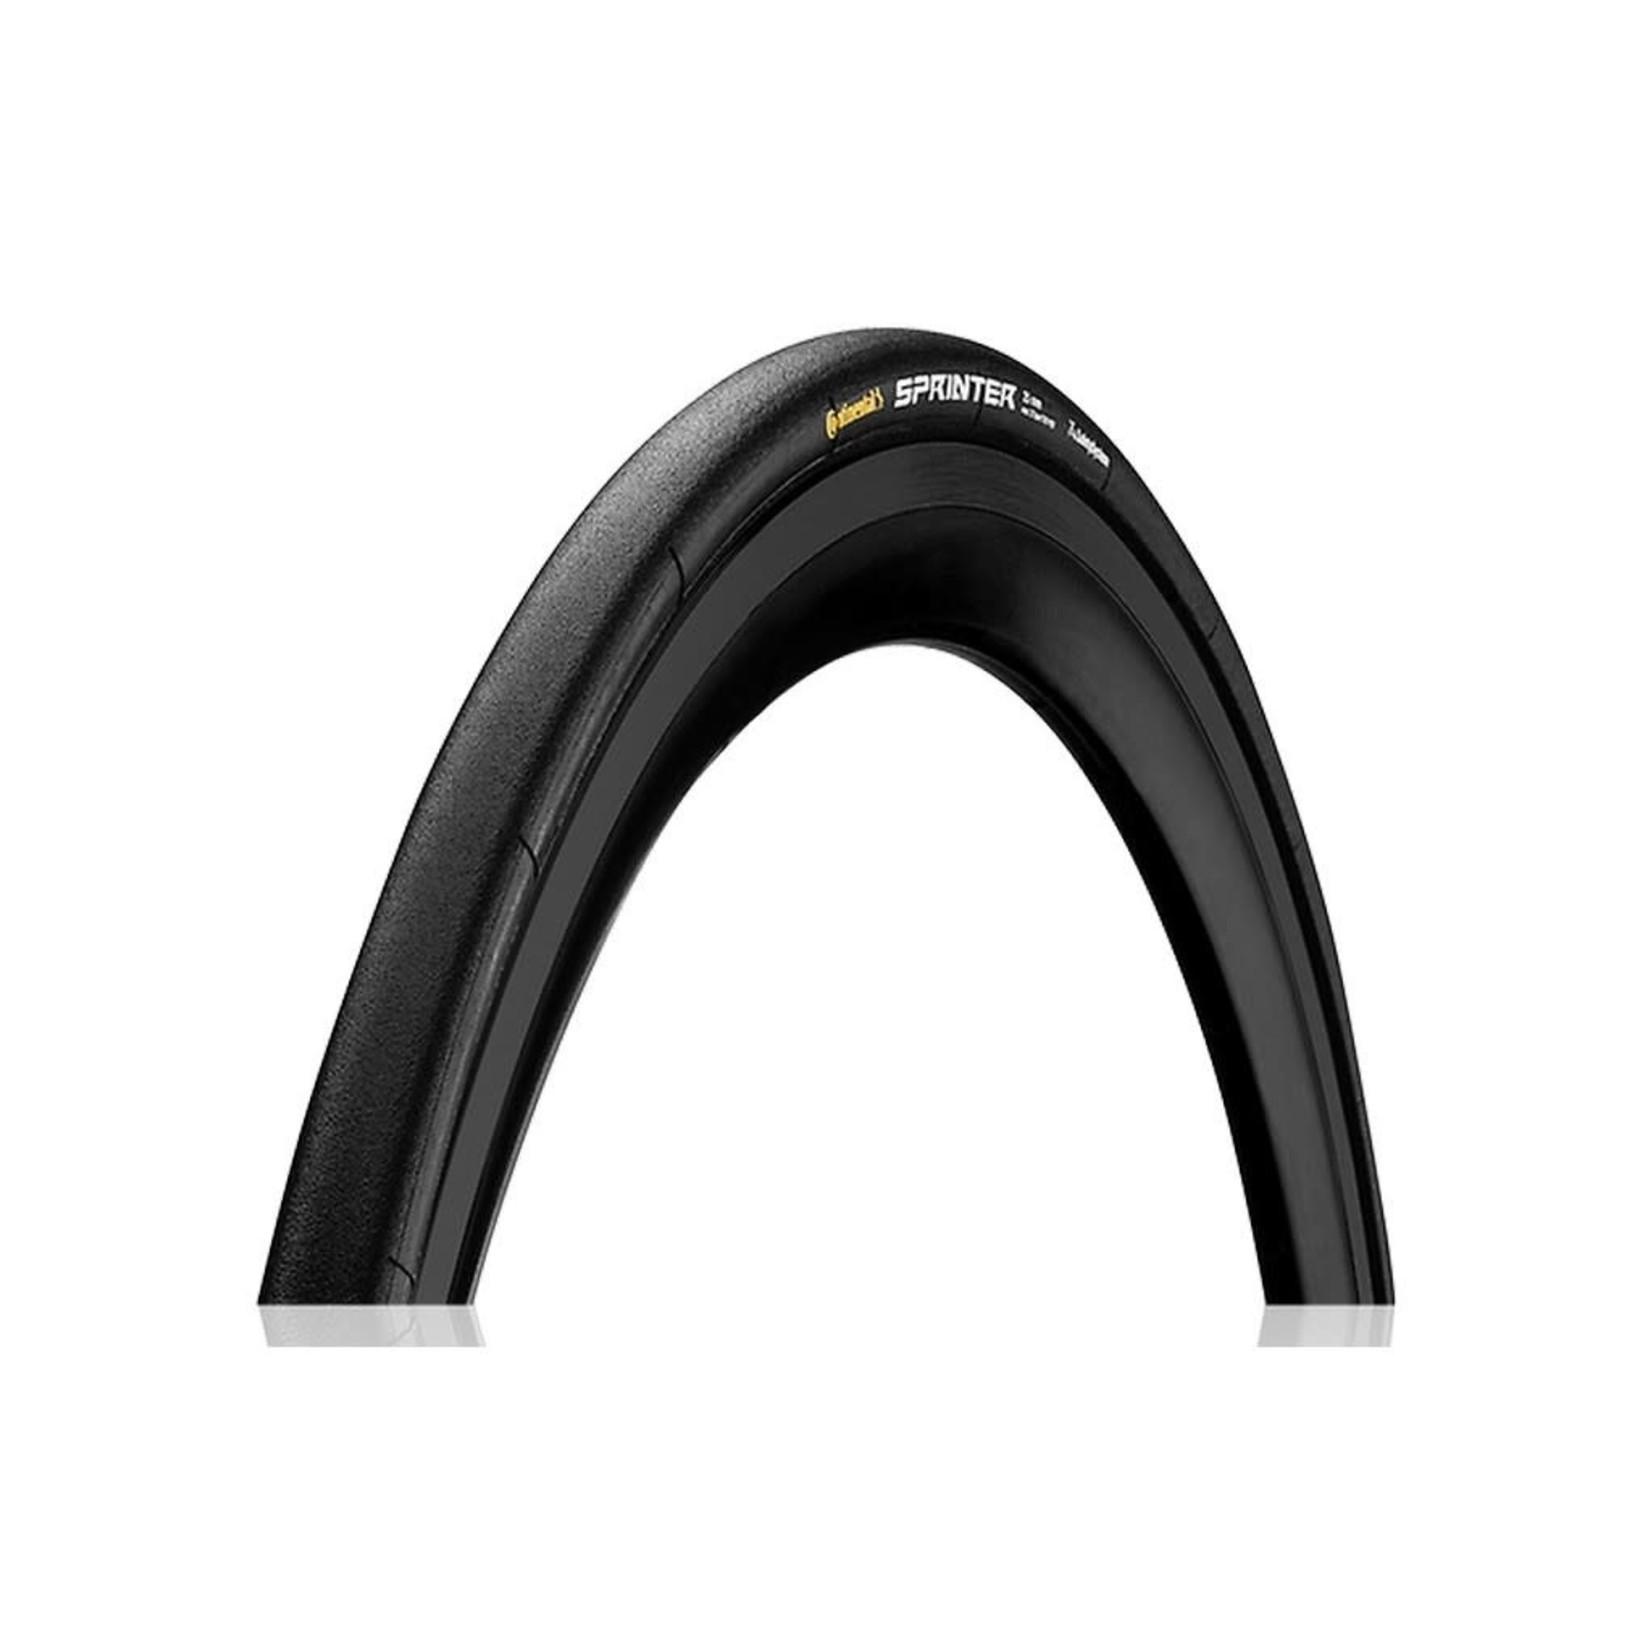 Continental Tire Continental Tubular Sprinter 700x22c Black